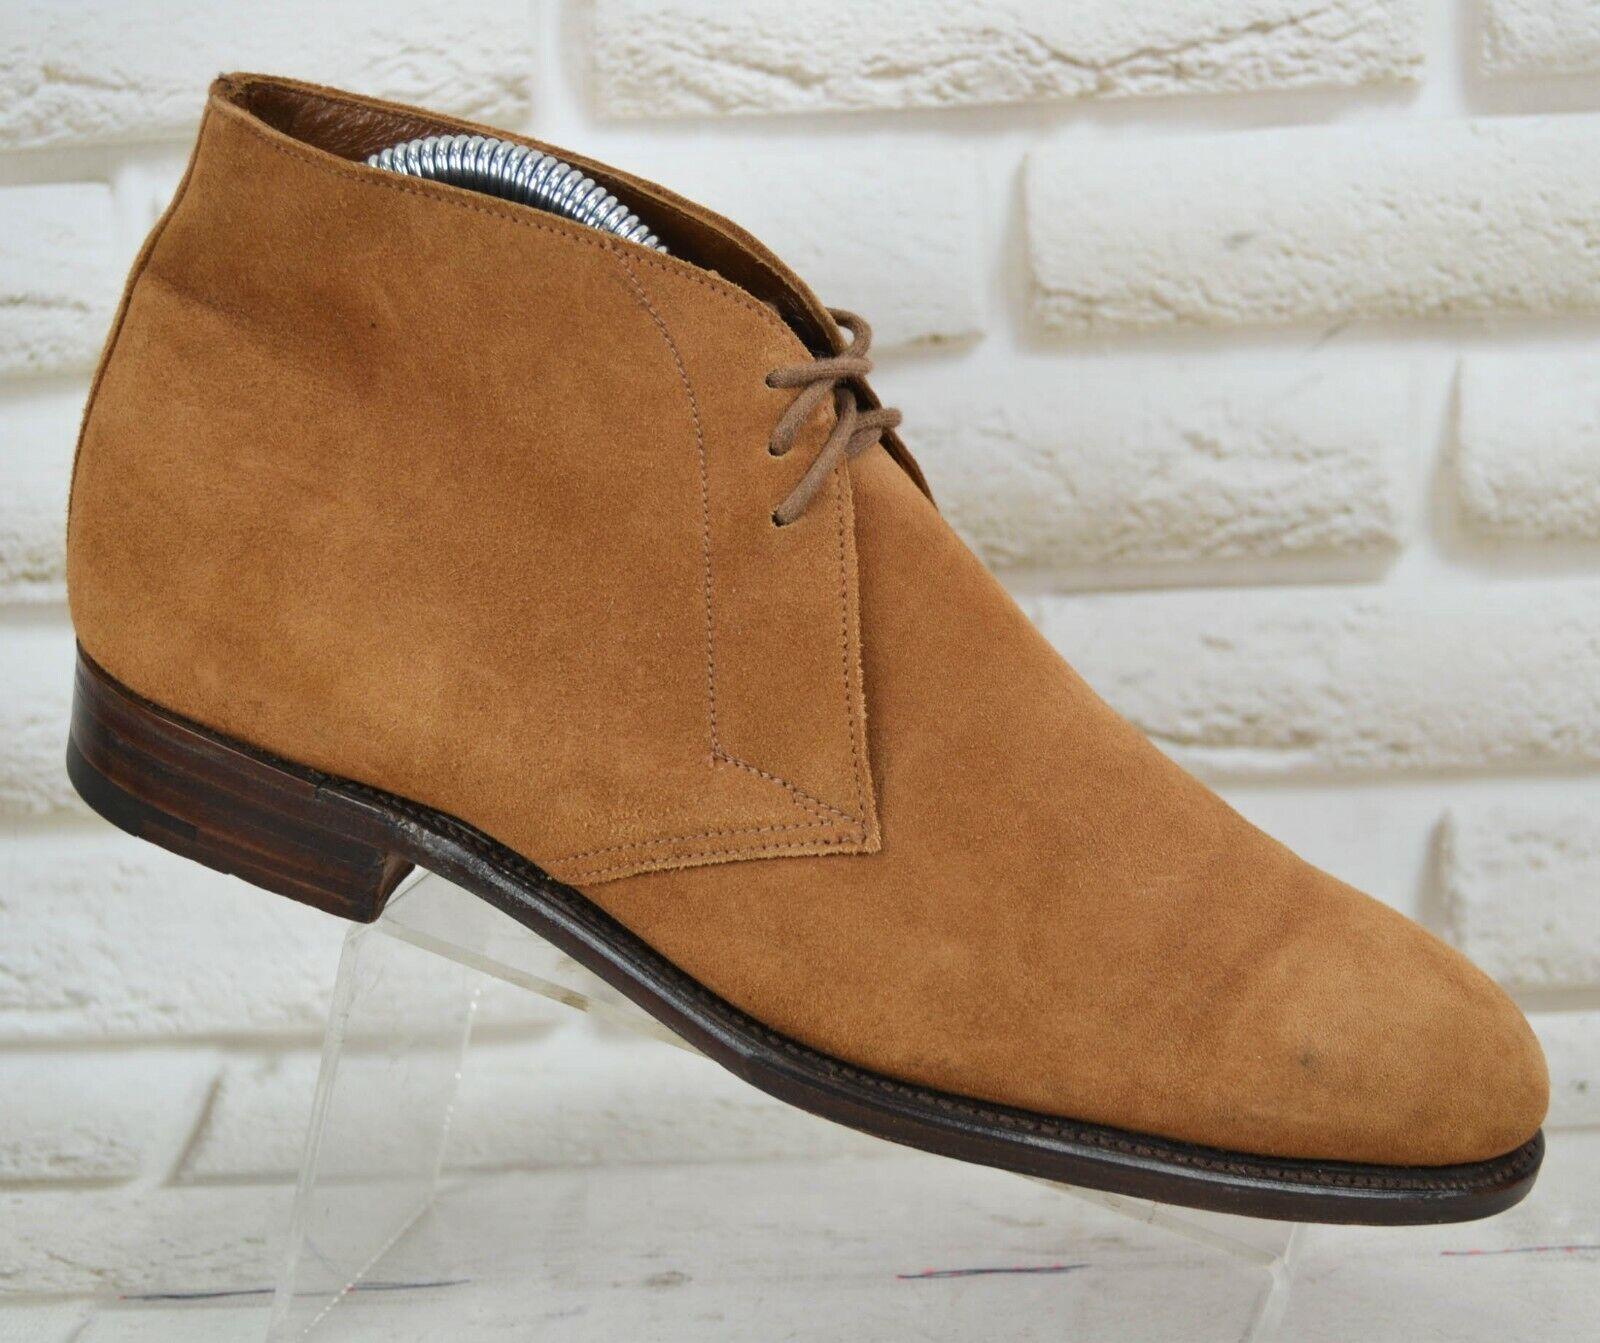 GRENSON damen braun Leather Ankle Stiefel Lace-Up schuhe ENGLAND Größe 5 UK 38 EU